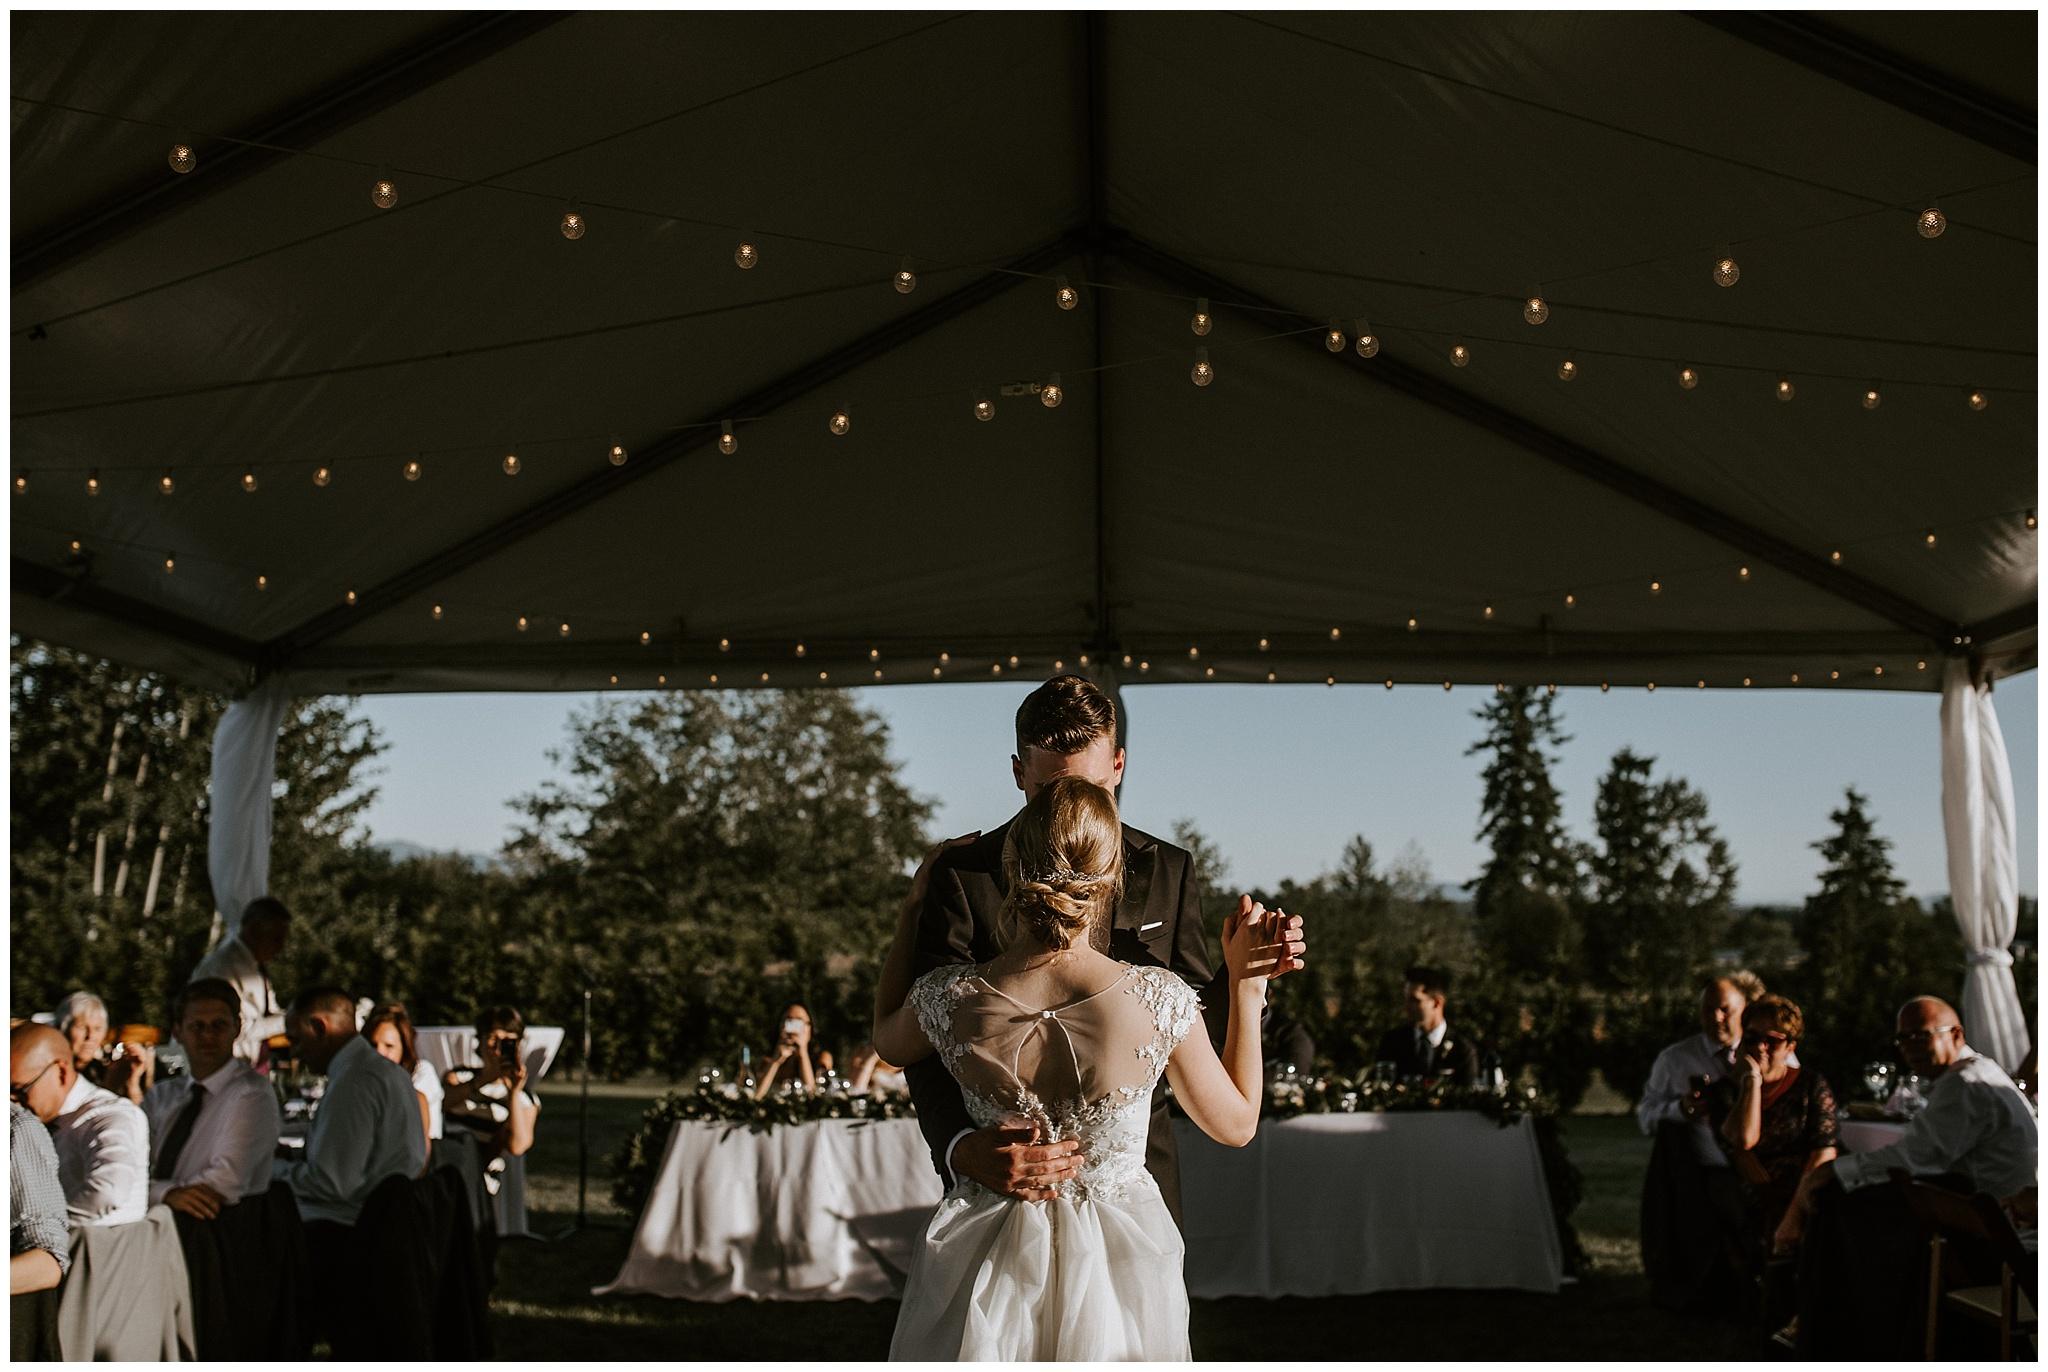 fort-langley-backyard-wedding-38.JPG